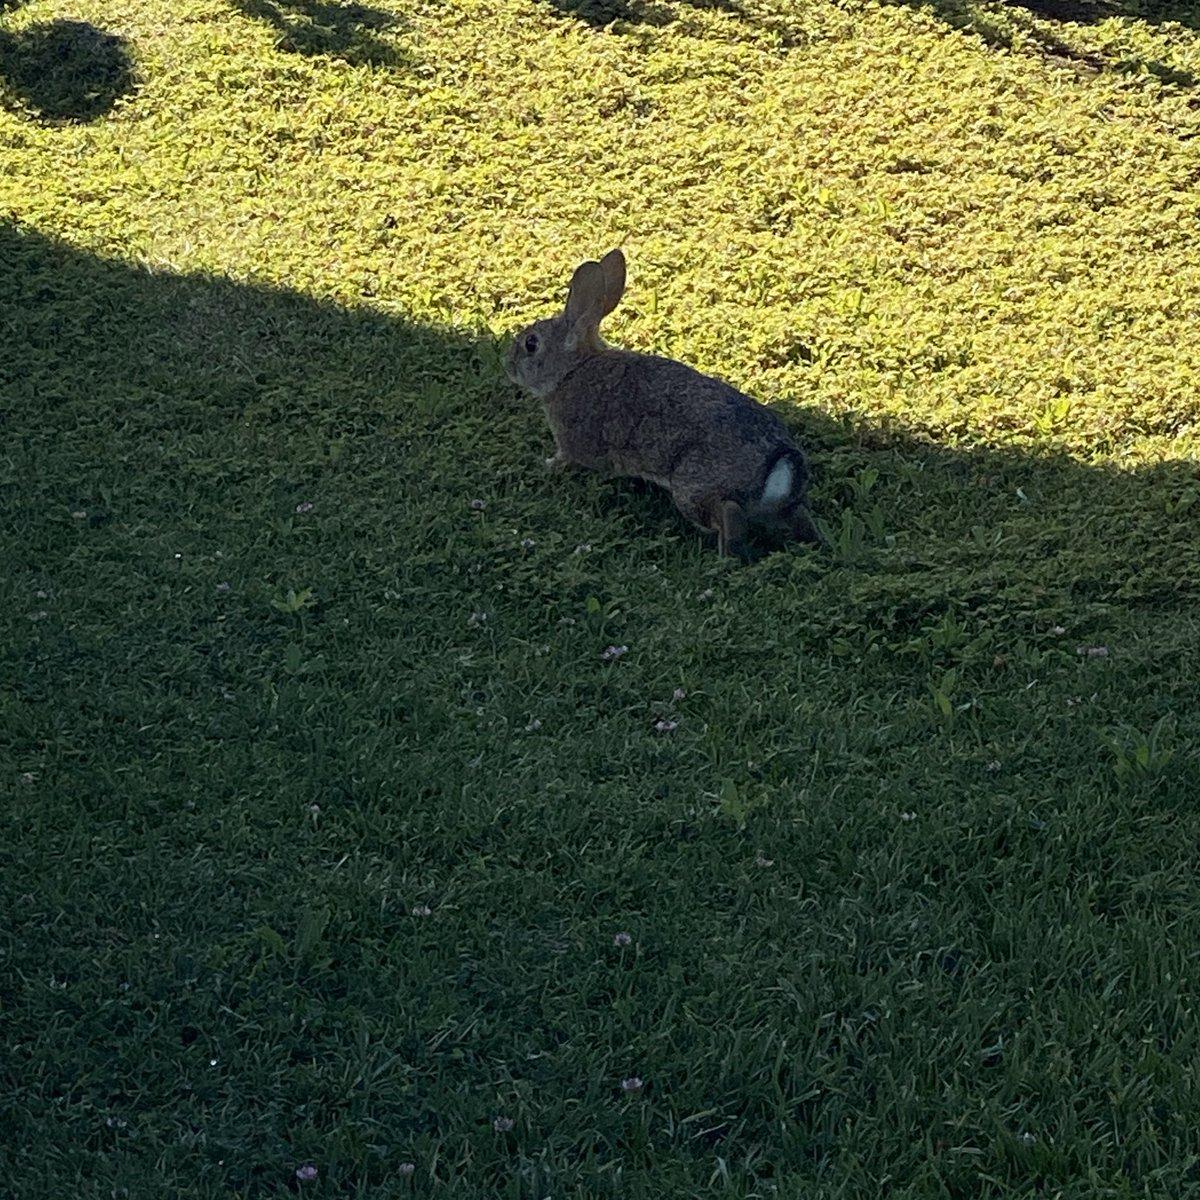 @lilnasxfp sorry i'm late happy birthday my love 🤍🤍🤍🤍🤍🤍🤍🤍🤍 here's a cute rabbit i saw earlier she's for u